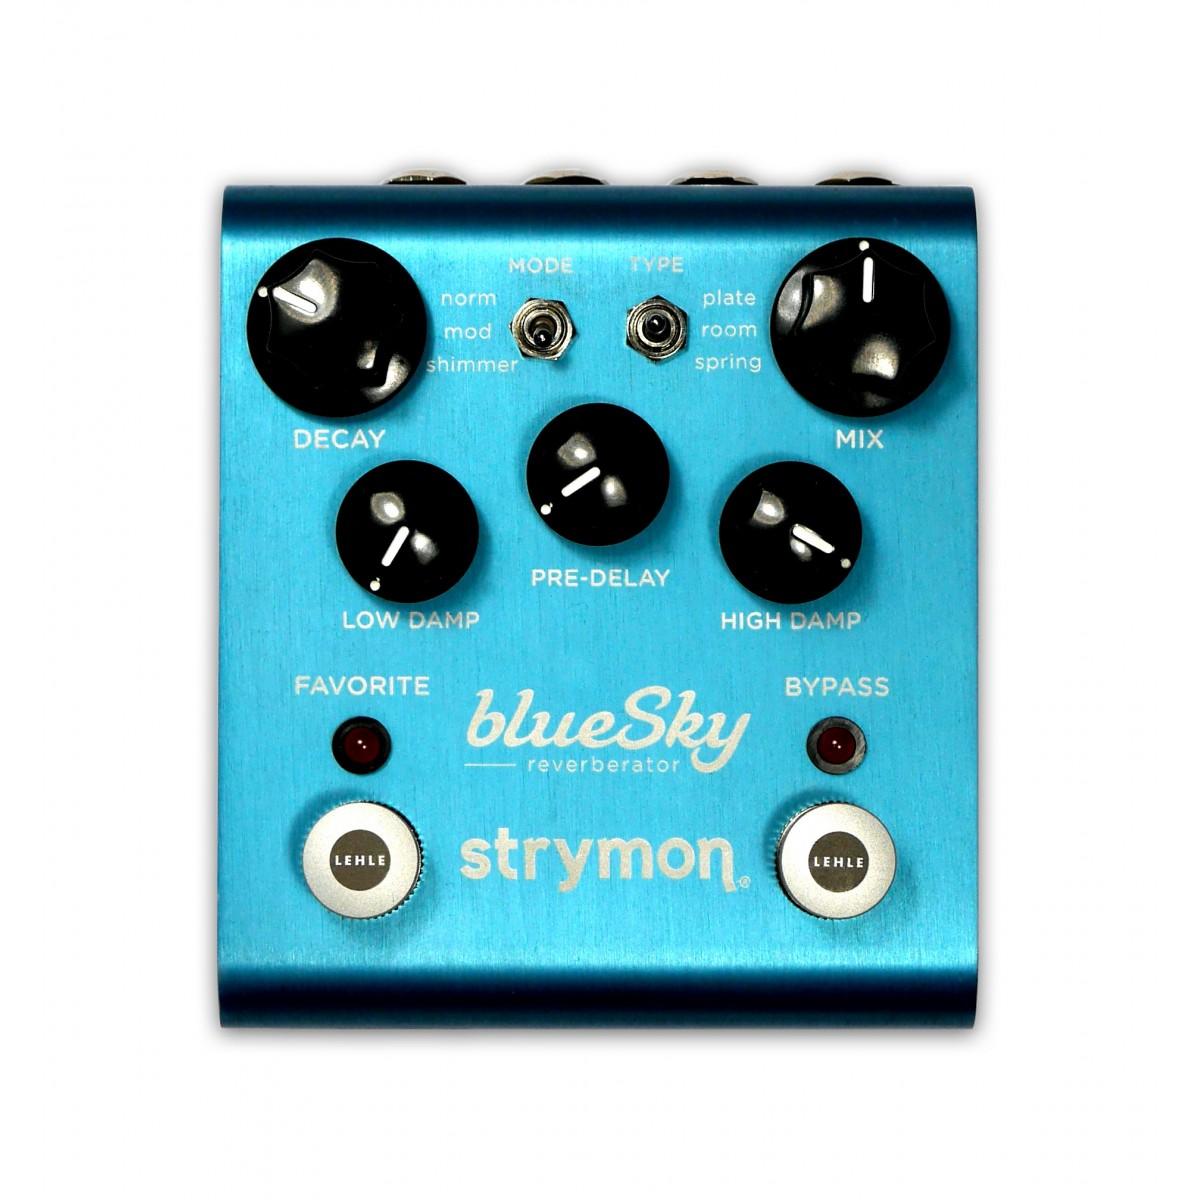 Thorpy Fx The Dane